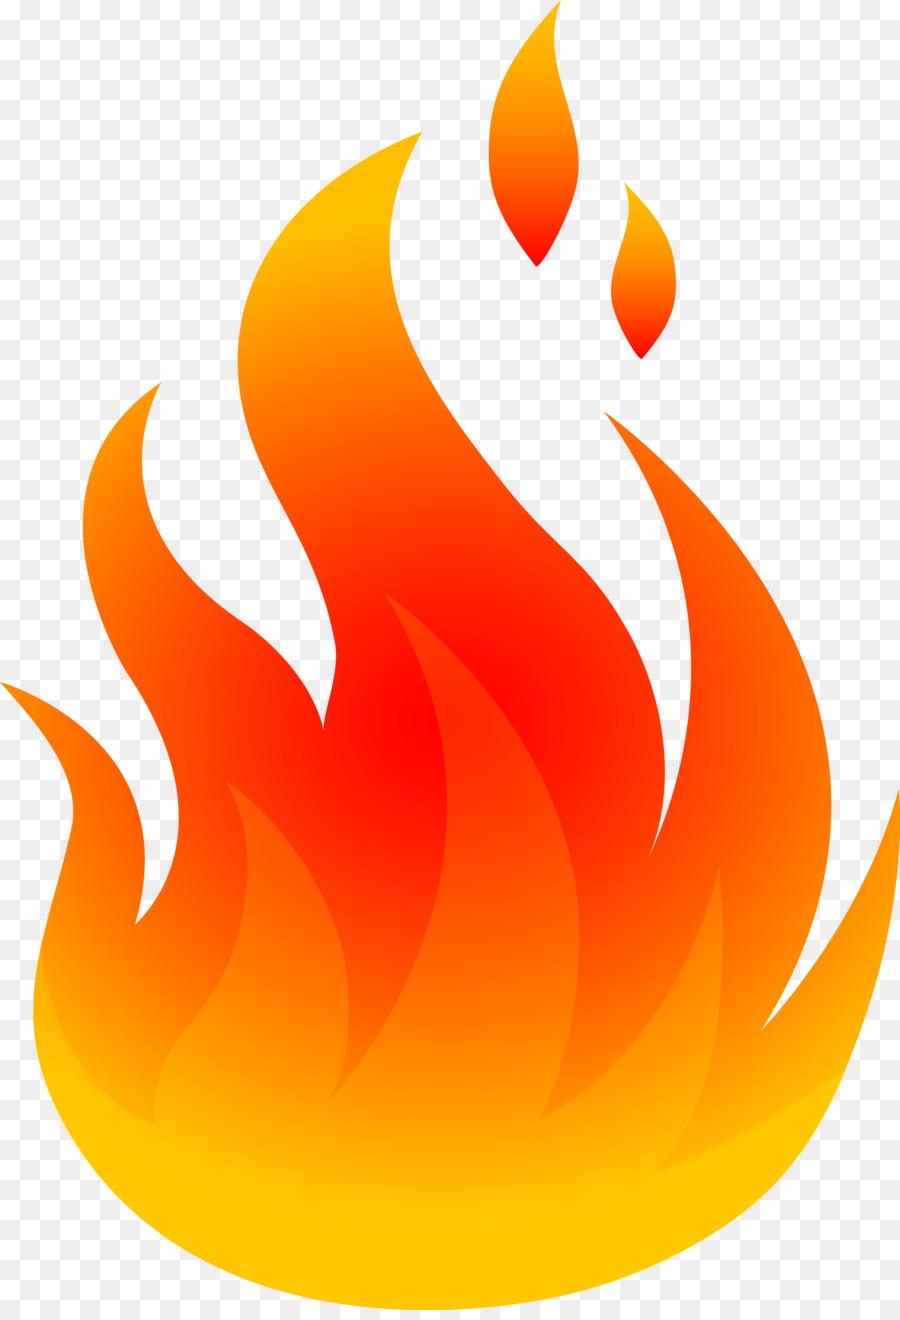 Feuer Flamme clipart.